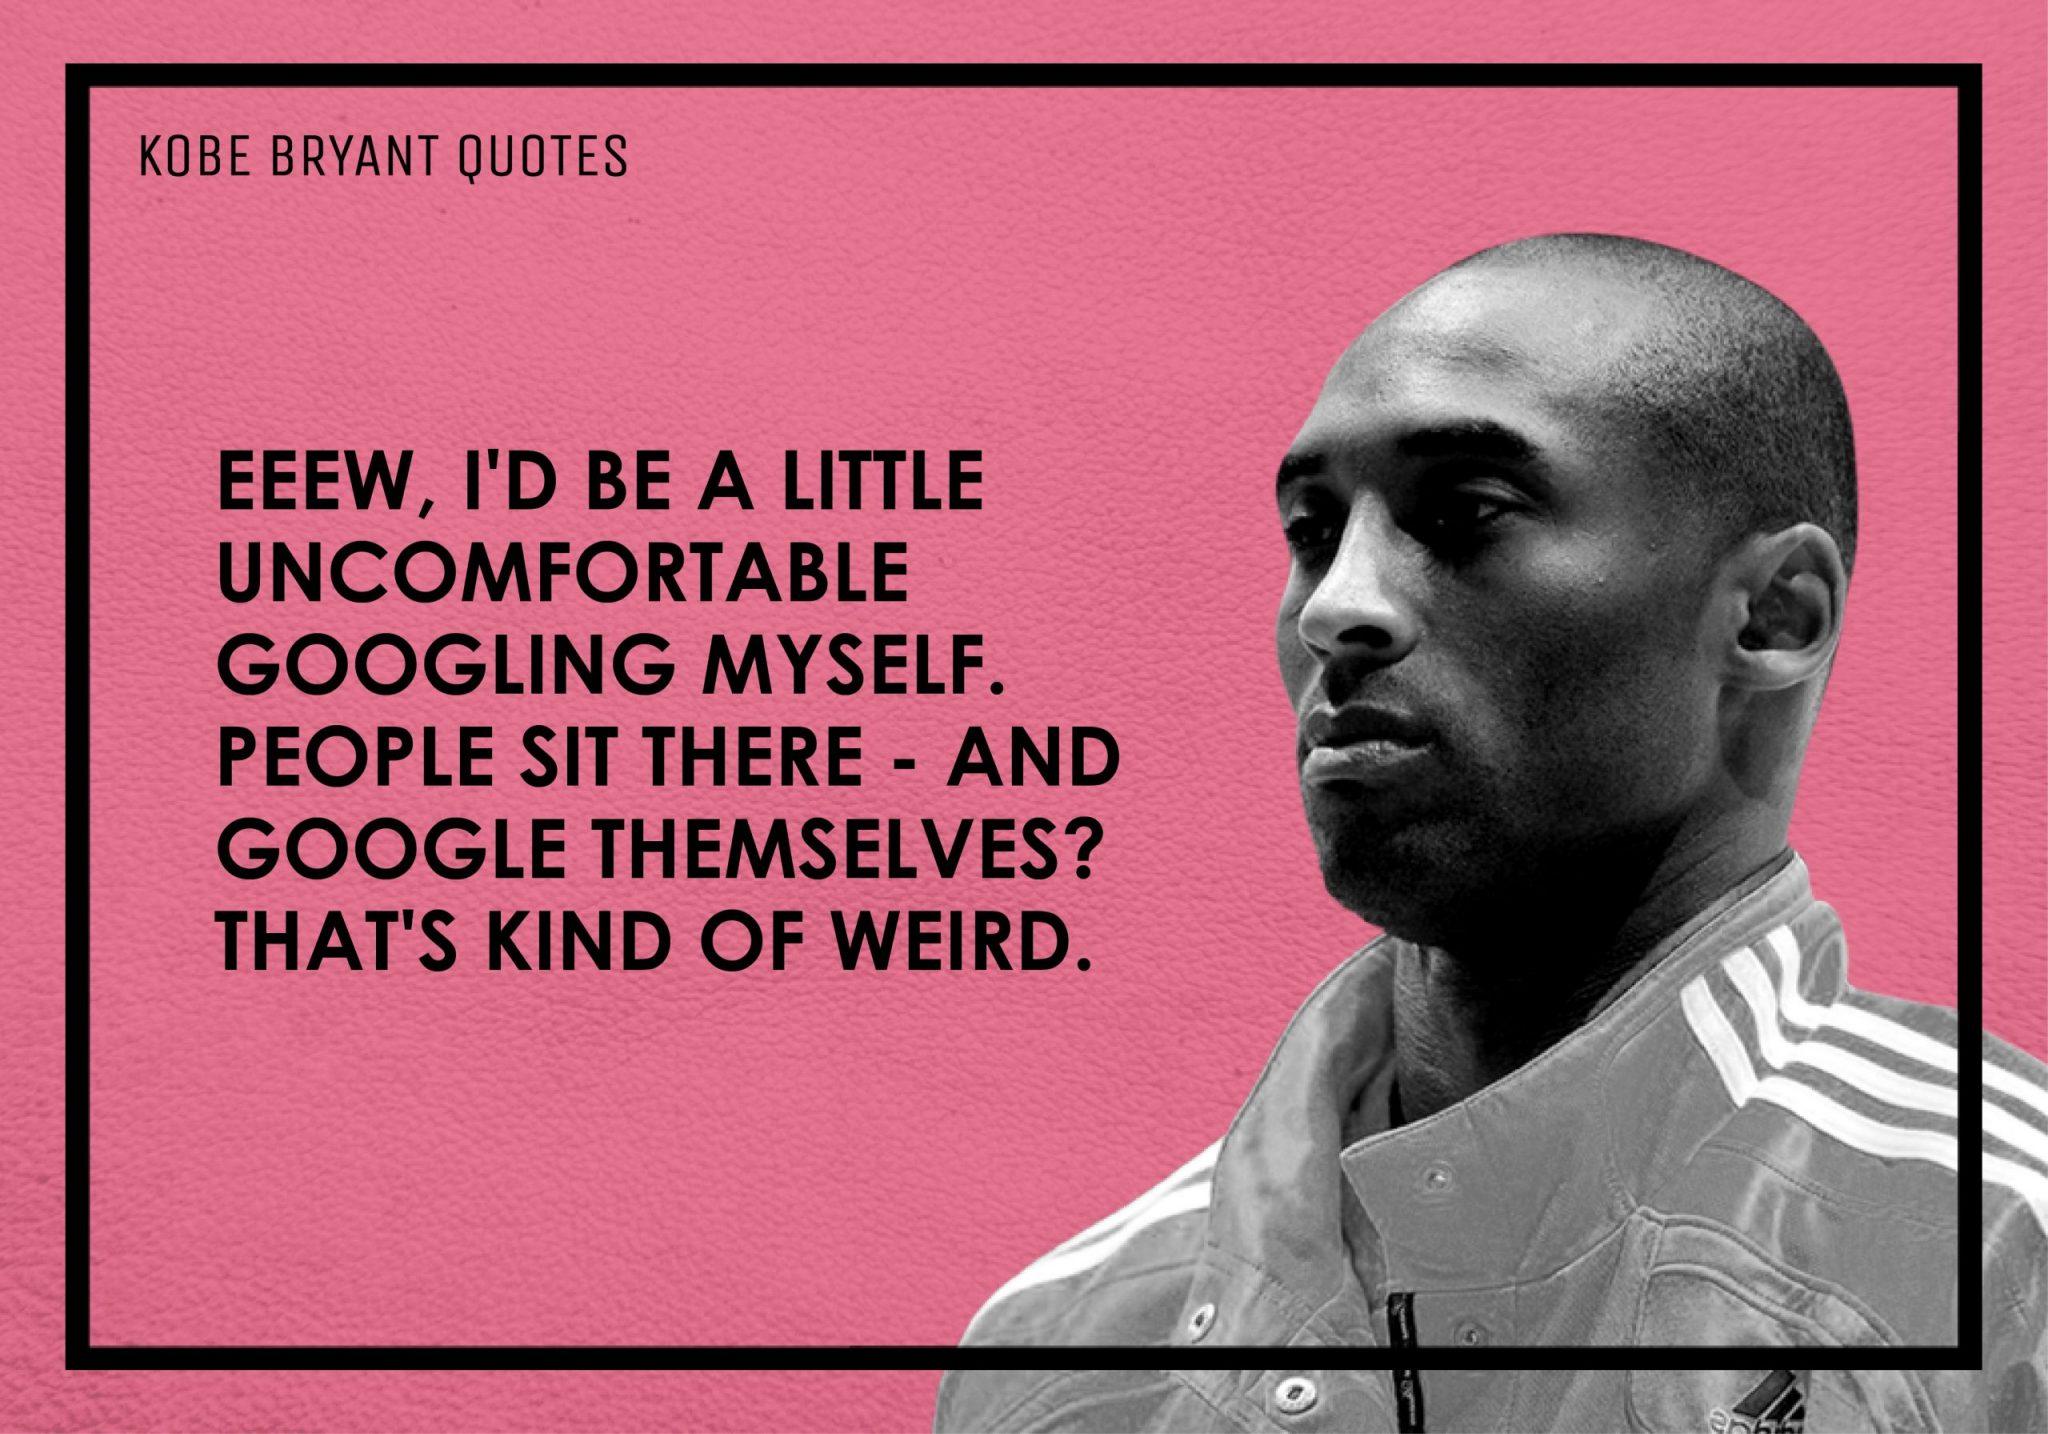 Kobe Bryant Quotes (11)